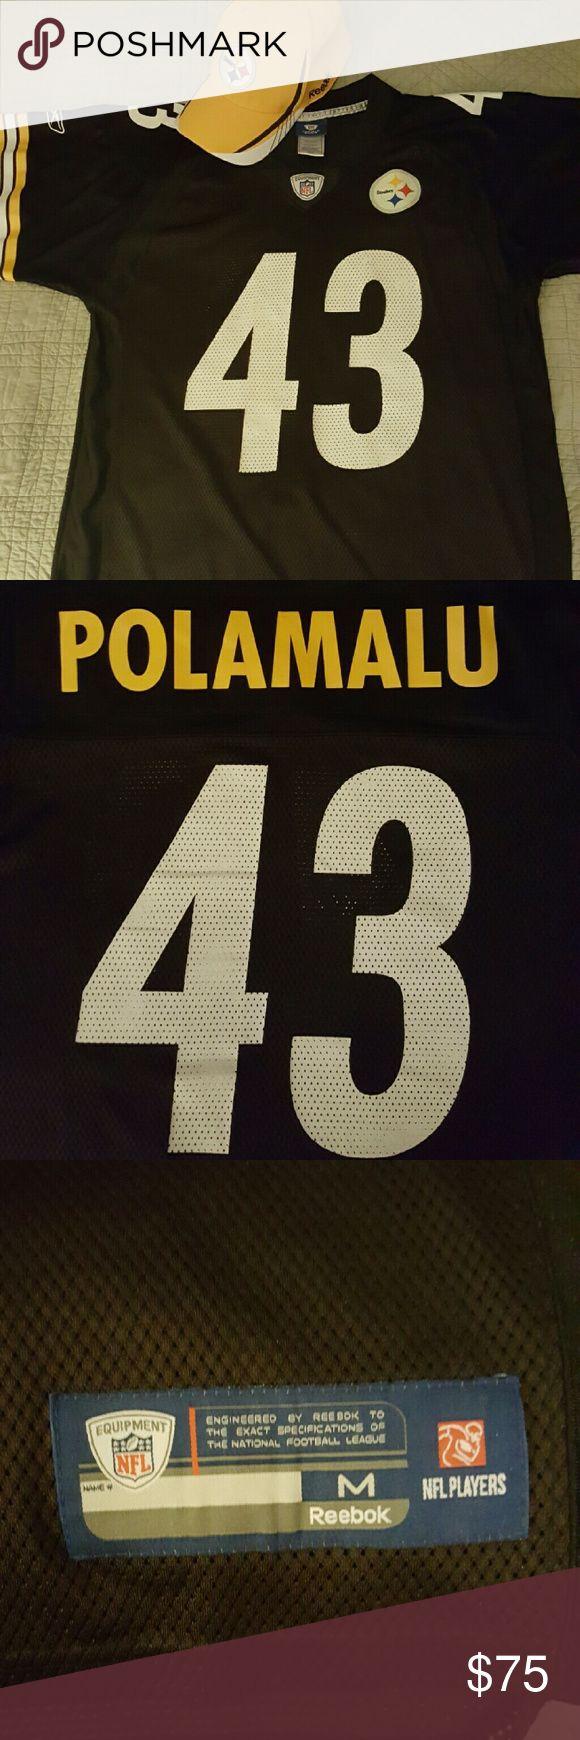 NFL Pittsburgh Steelers Jersey Polamalu #43 offical NFL jersey size M. Includes offical NFL Steerlers baseball hat. No sign of wear. No trades. NFL Shirts